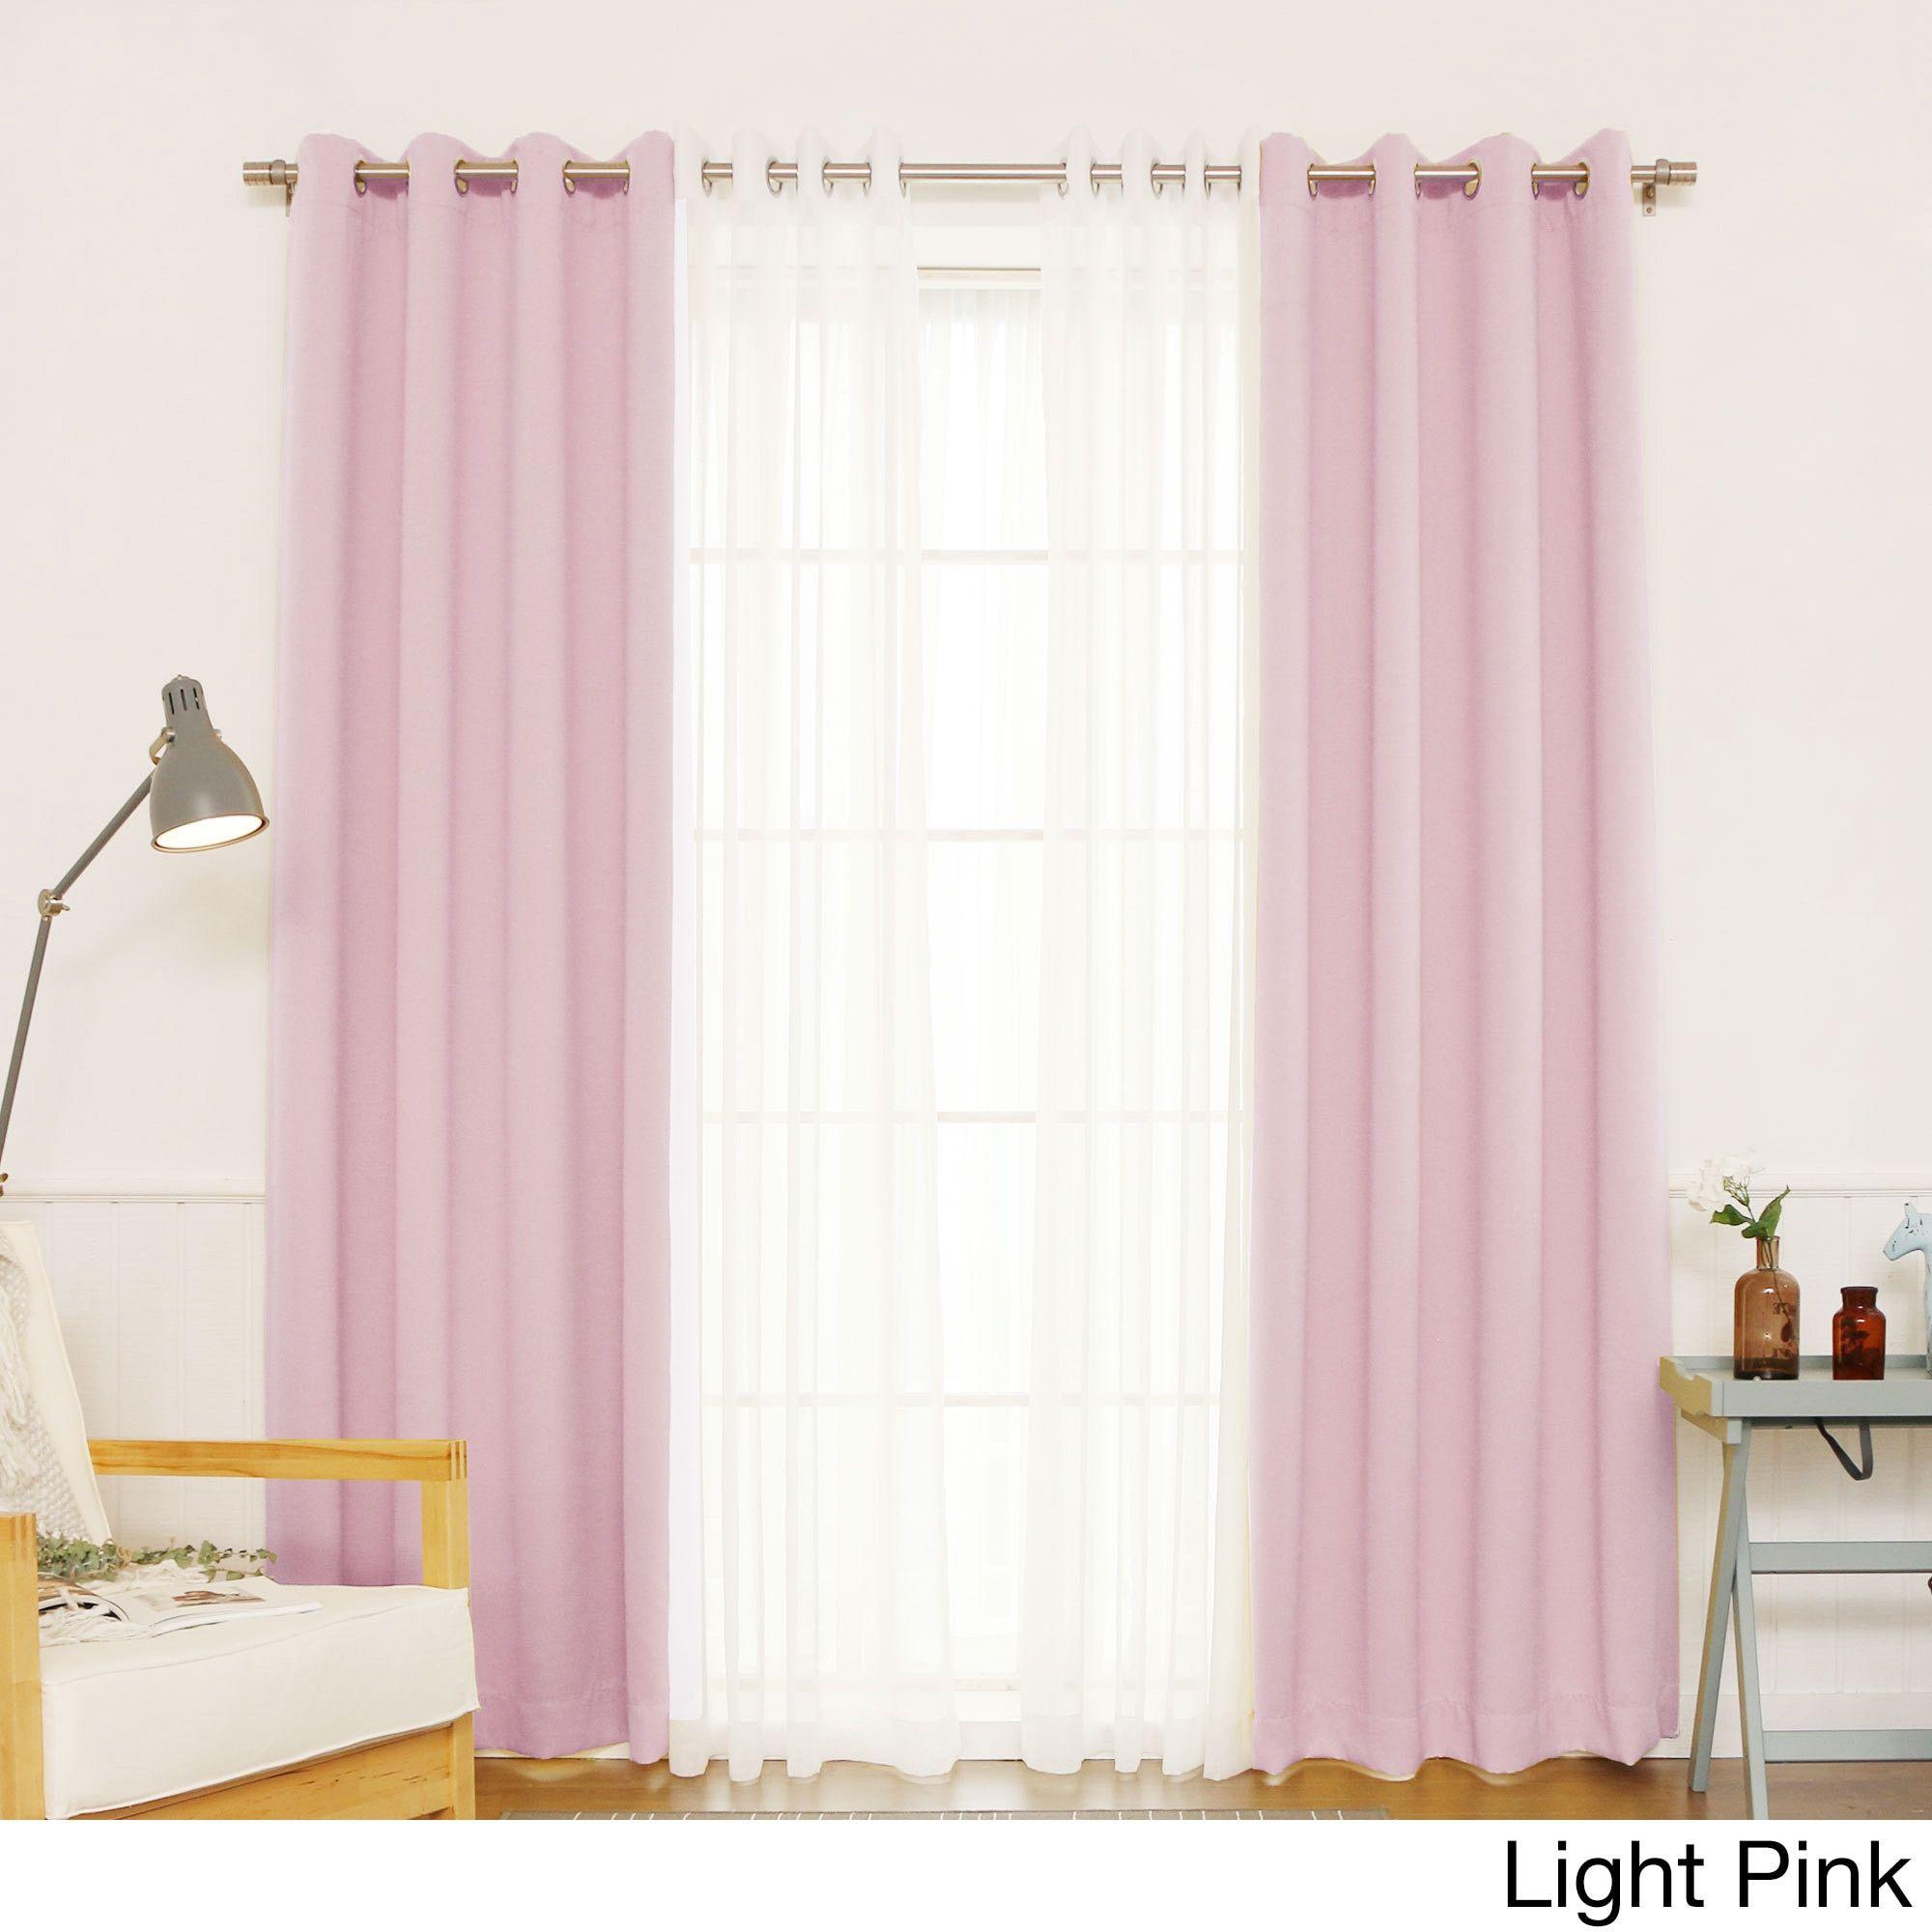 Aurora Home Mix Match Blackout And Muji Sheer 4 Piece Curtain